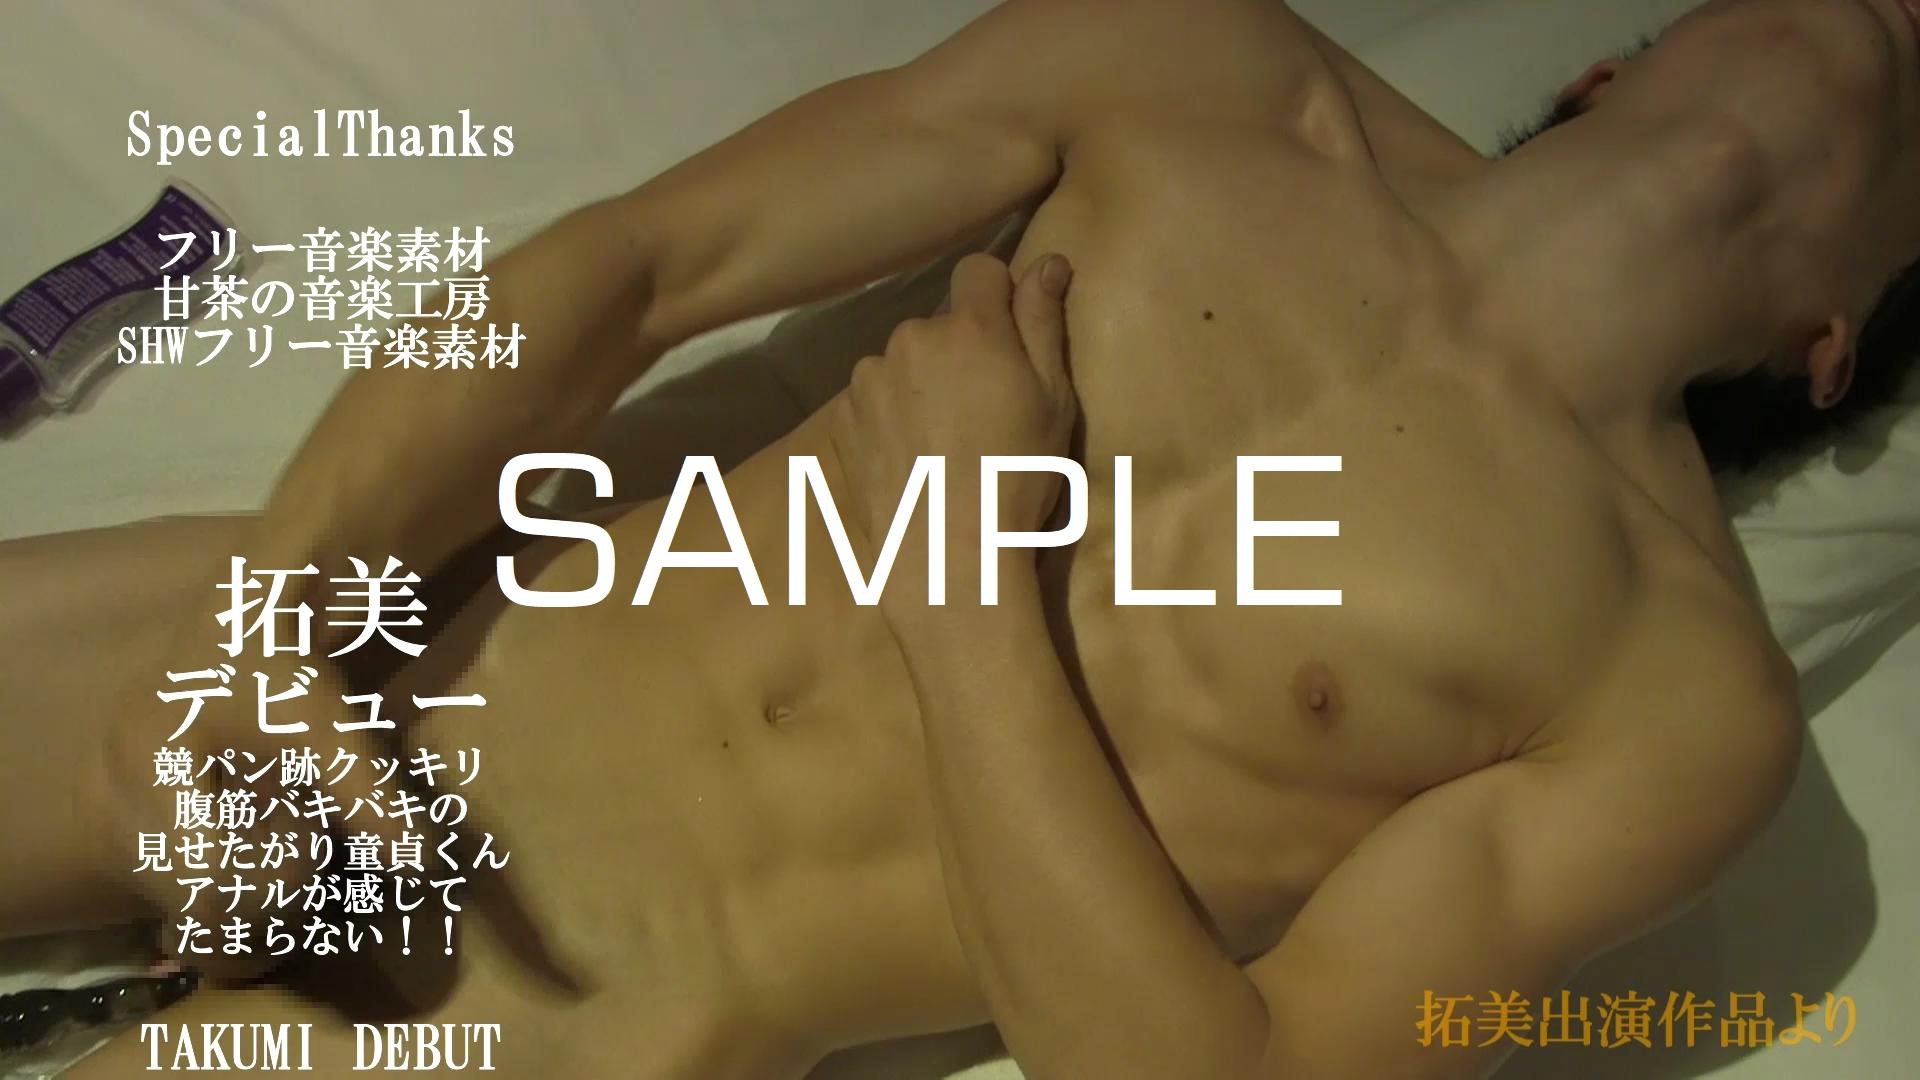 takumi-debut-part-02-samplephoto-09.jpg